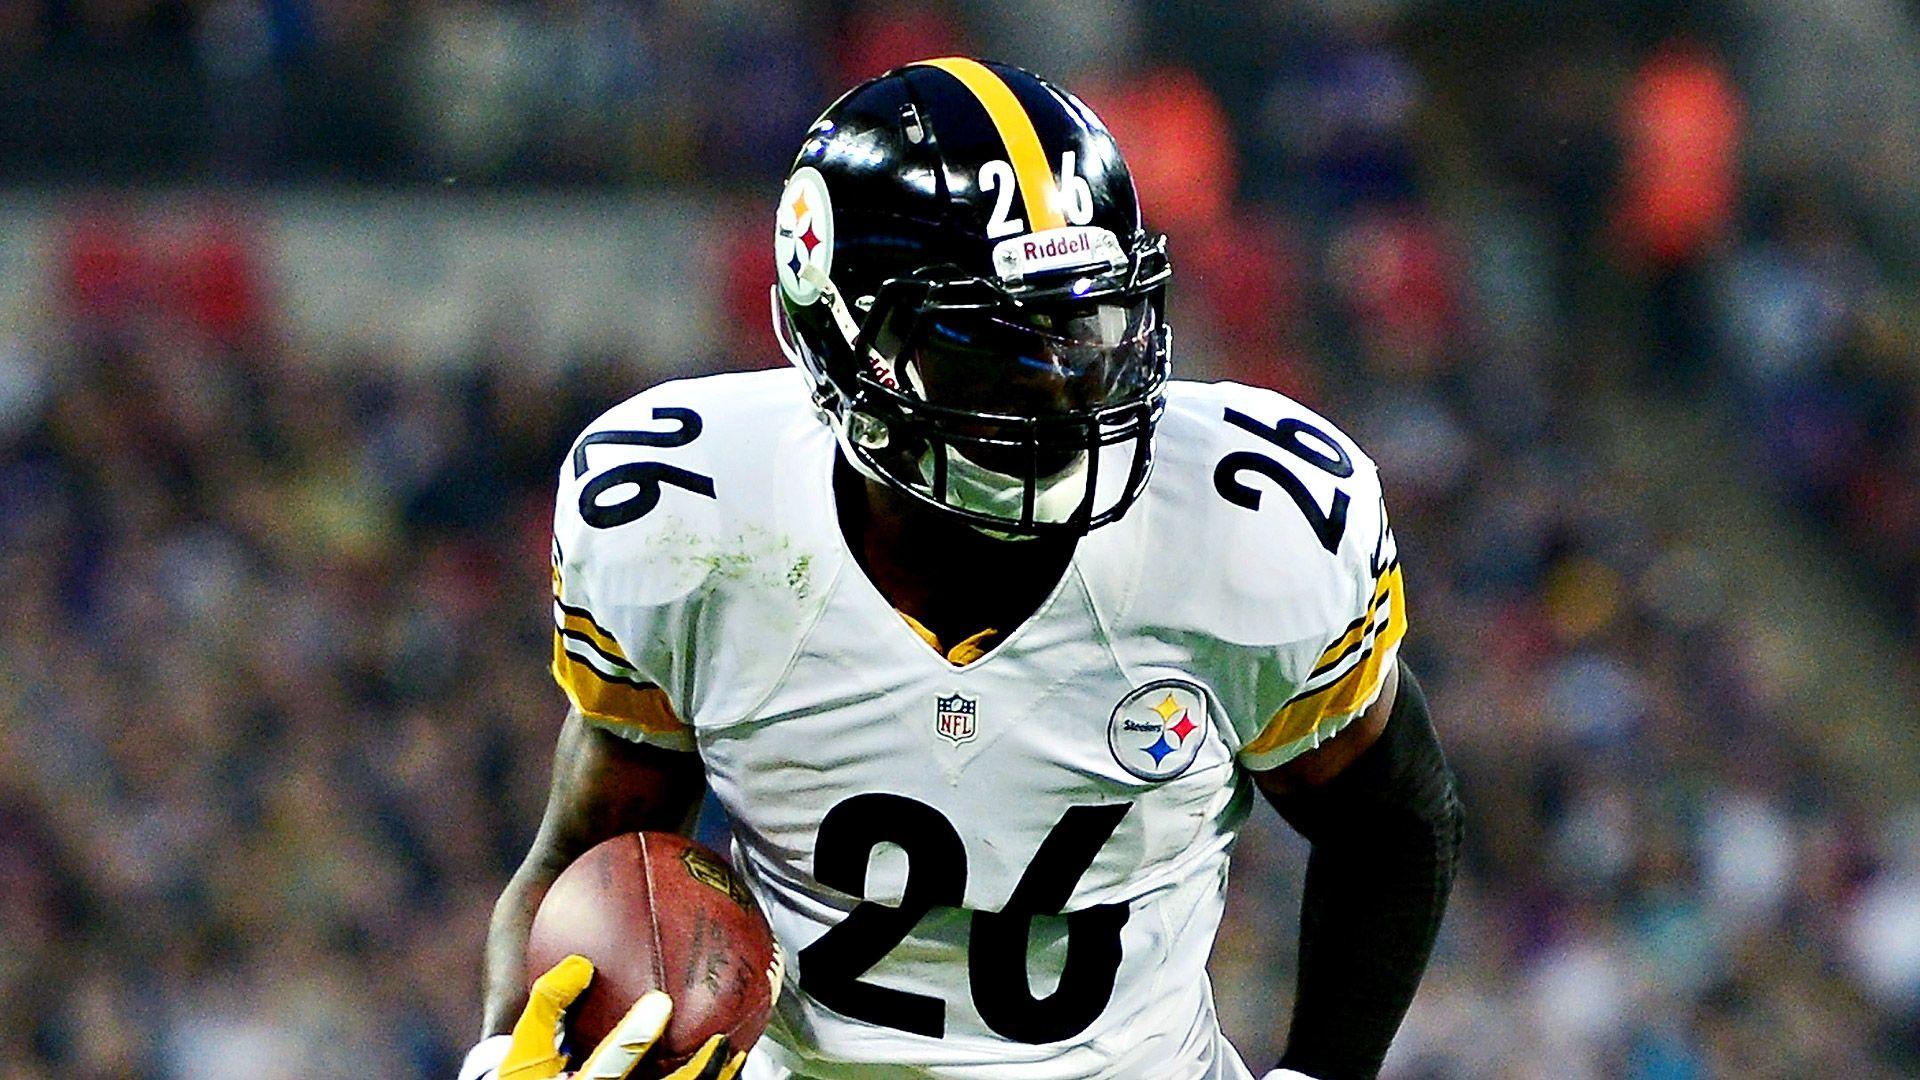 Pittsburgh Steelers running back Le'Veon Bell implies on Twitter he will return September 1